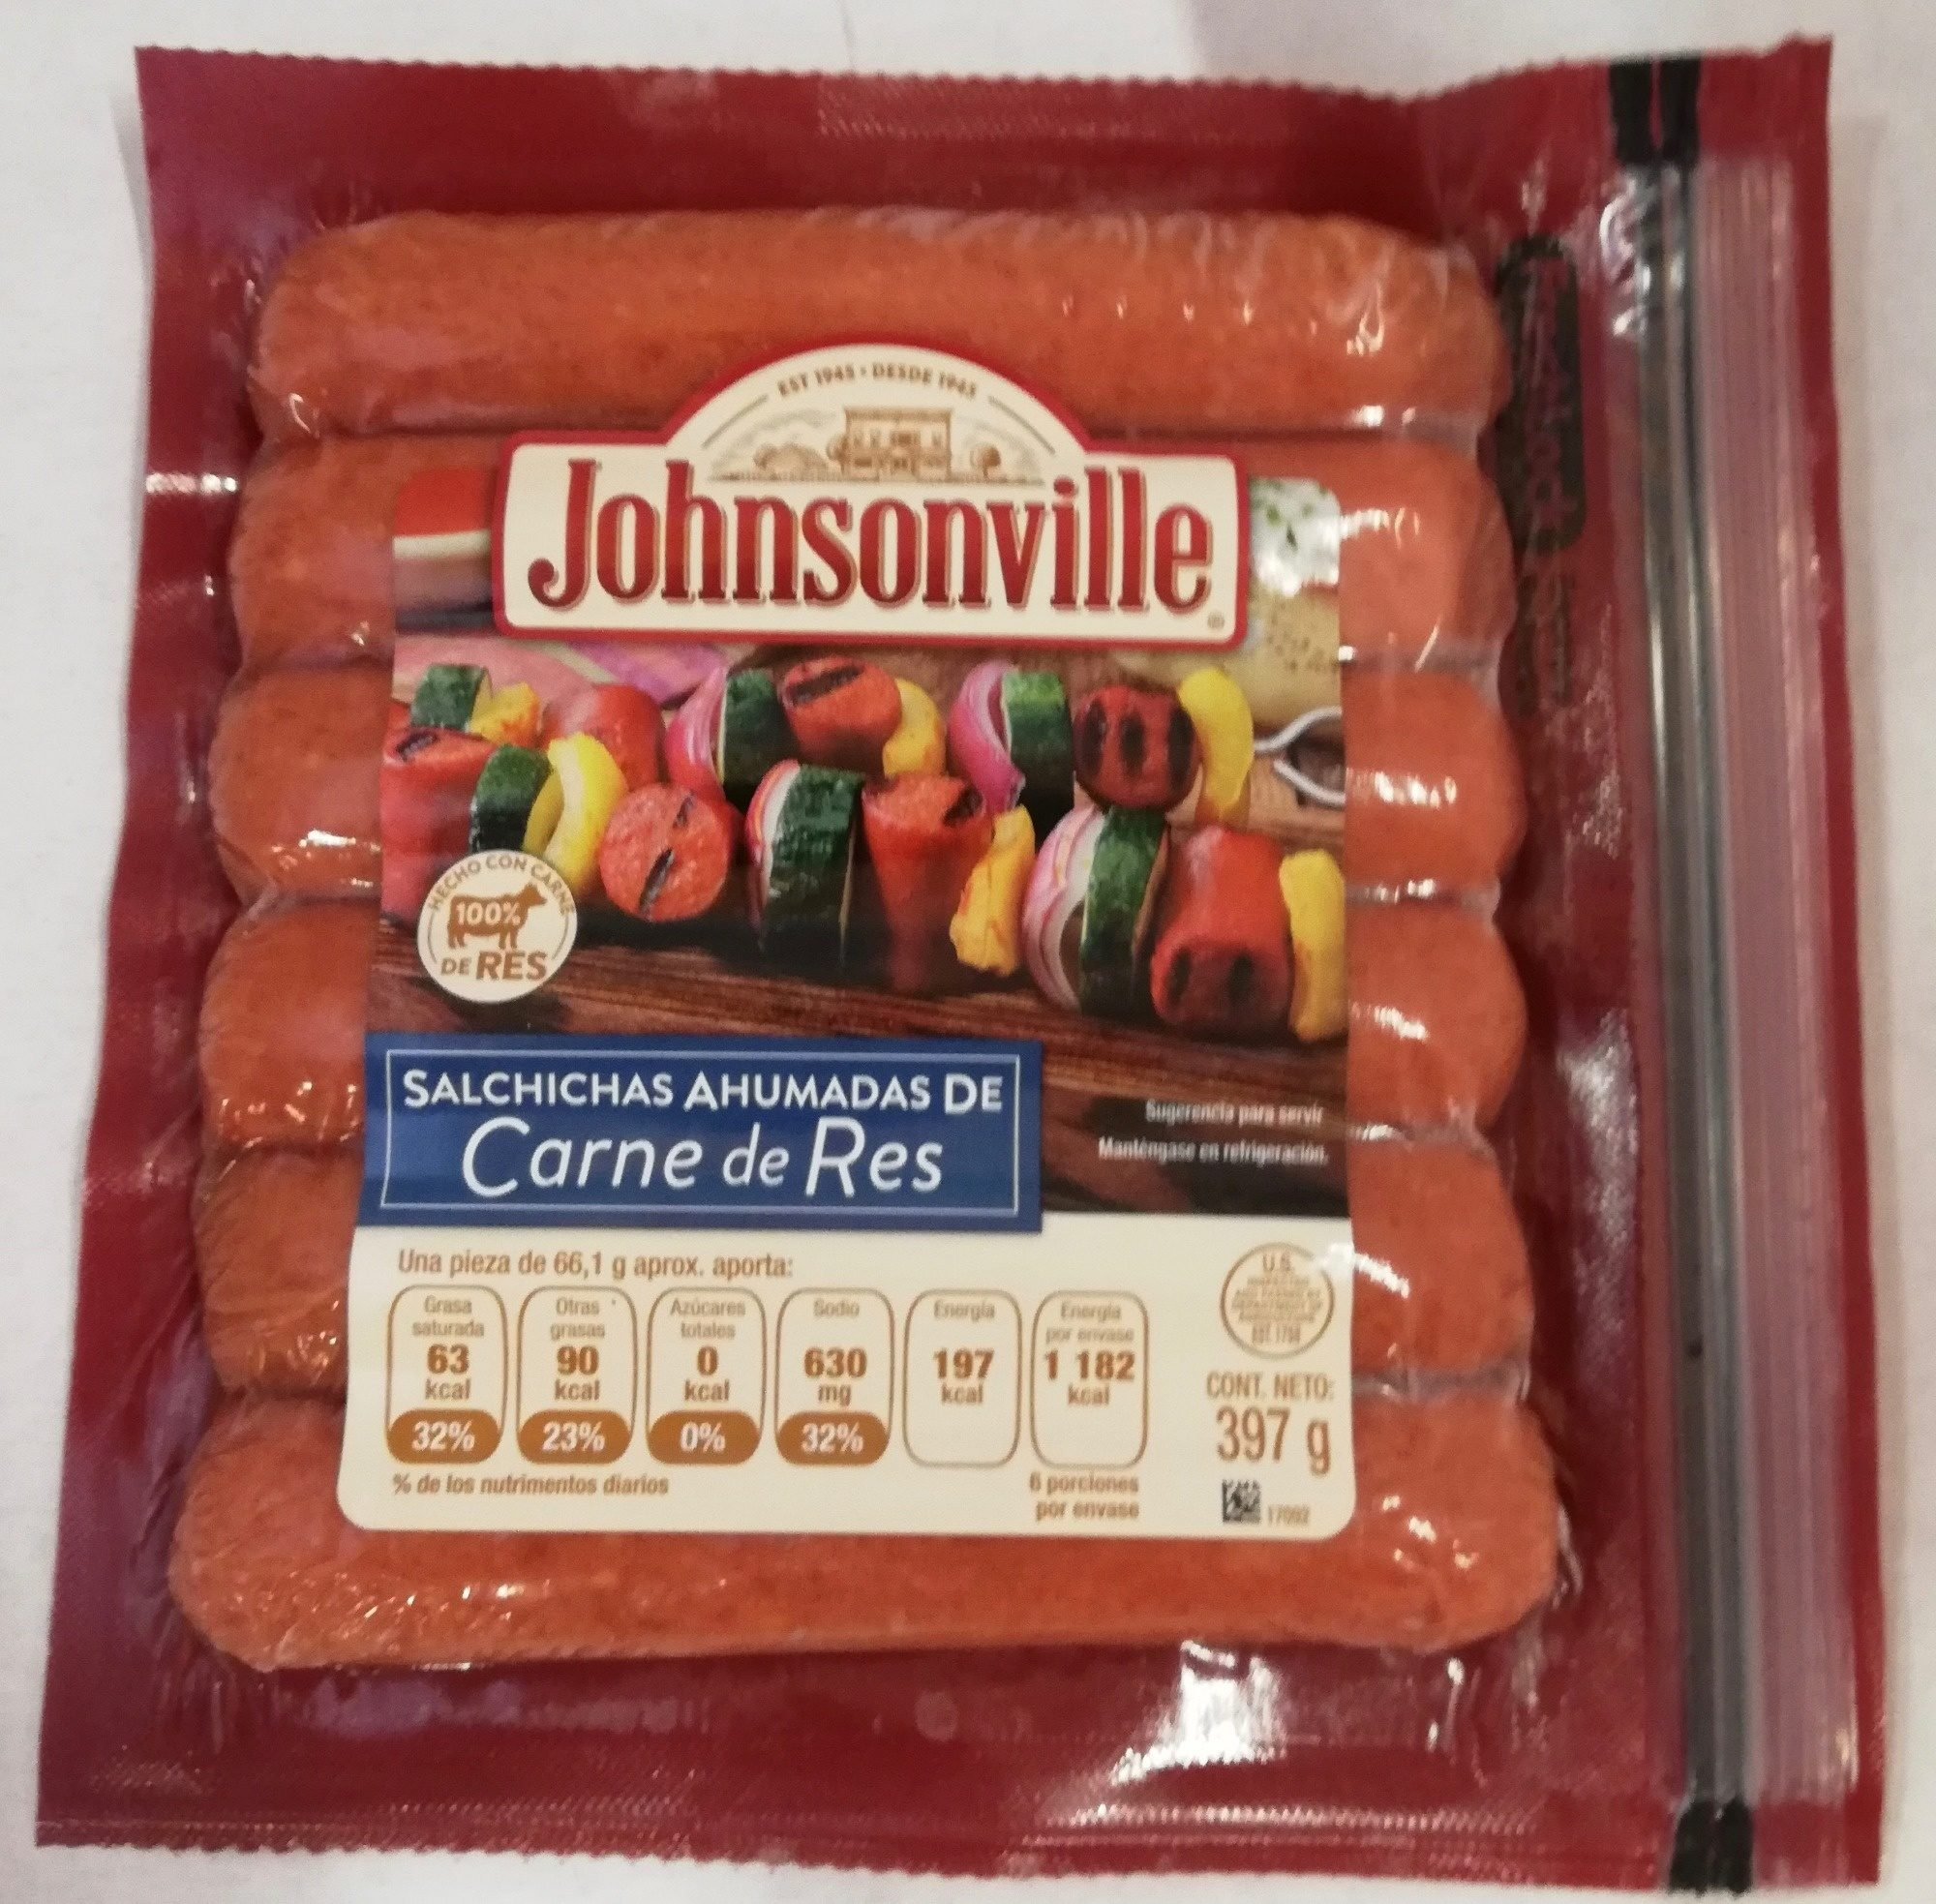 Johnsonville salchichas ahumadas de carne de res - Product - es